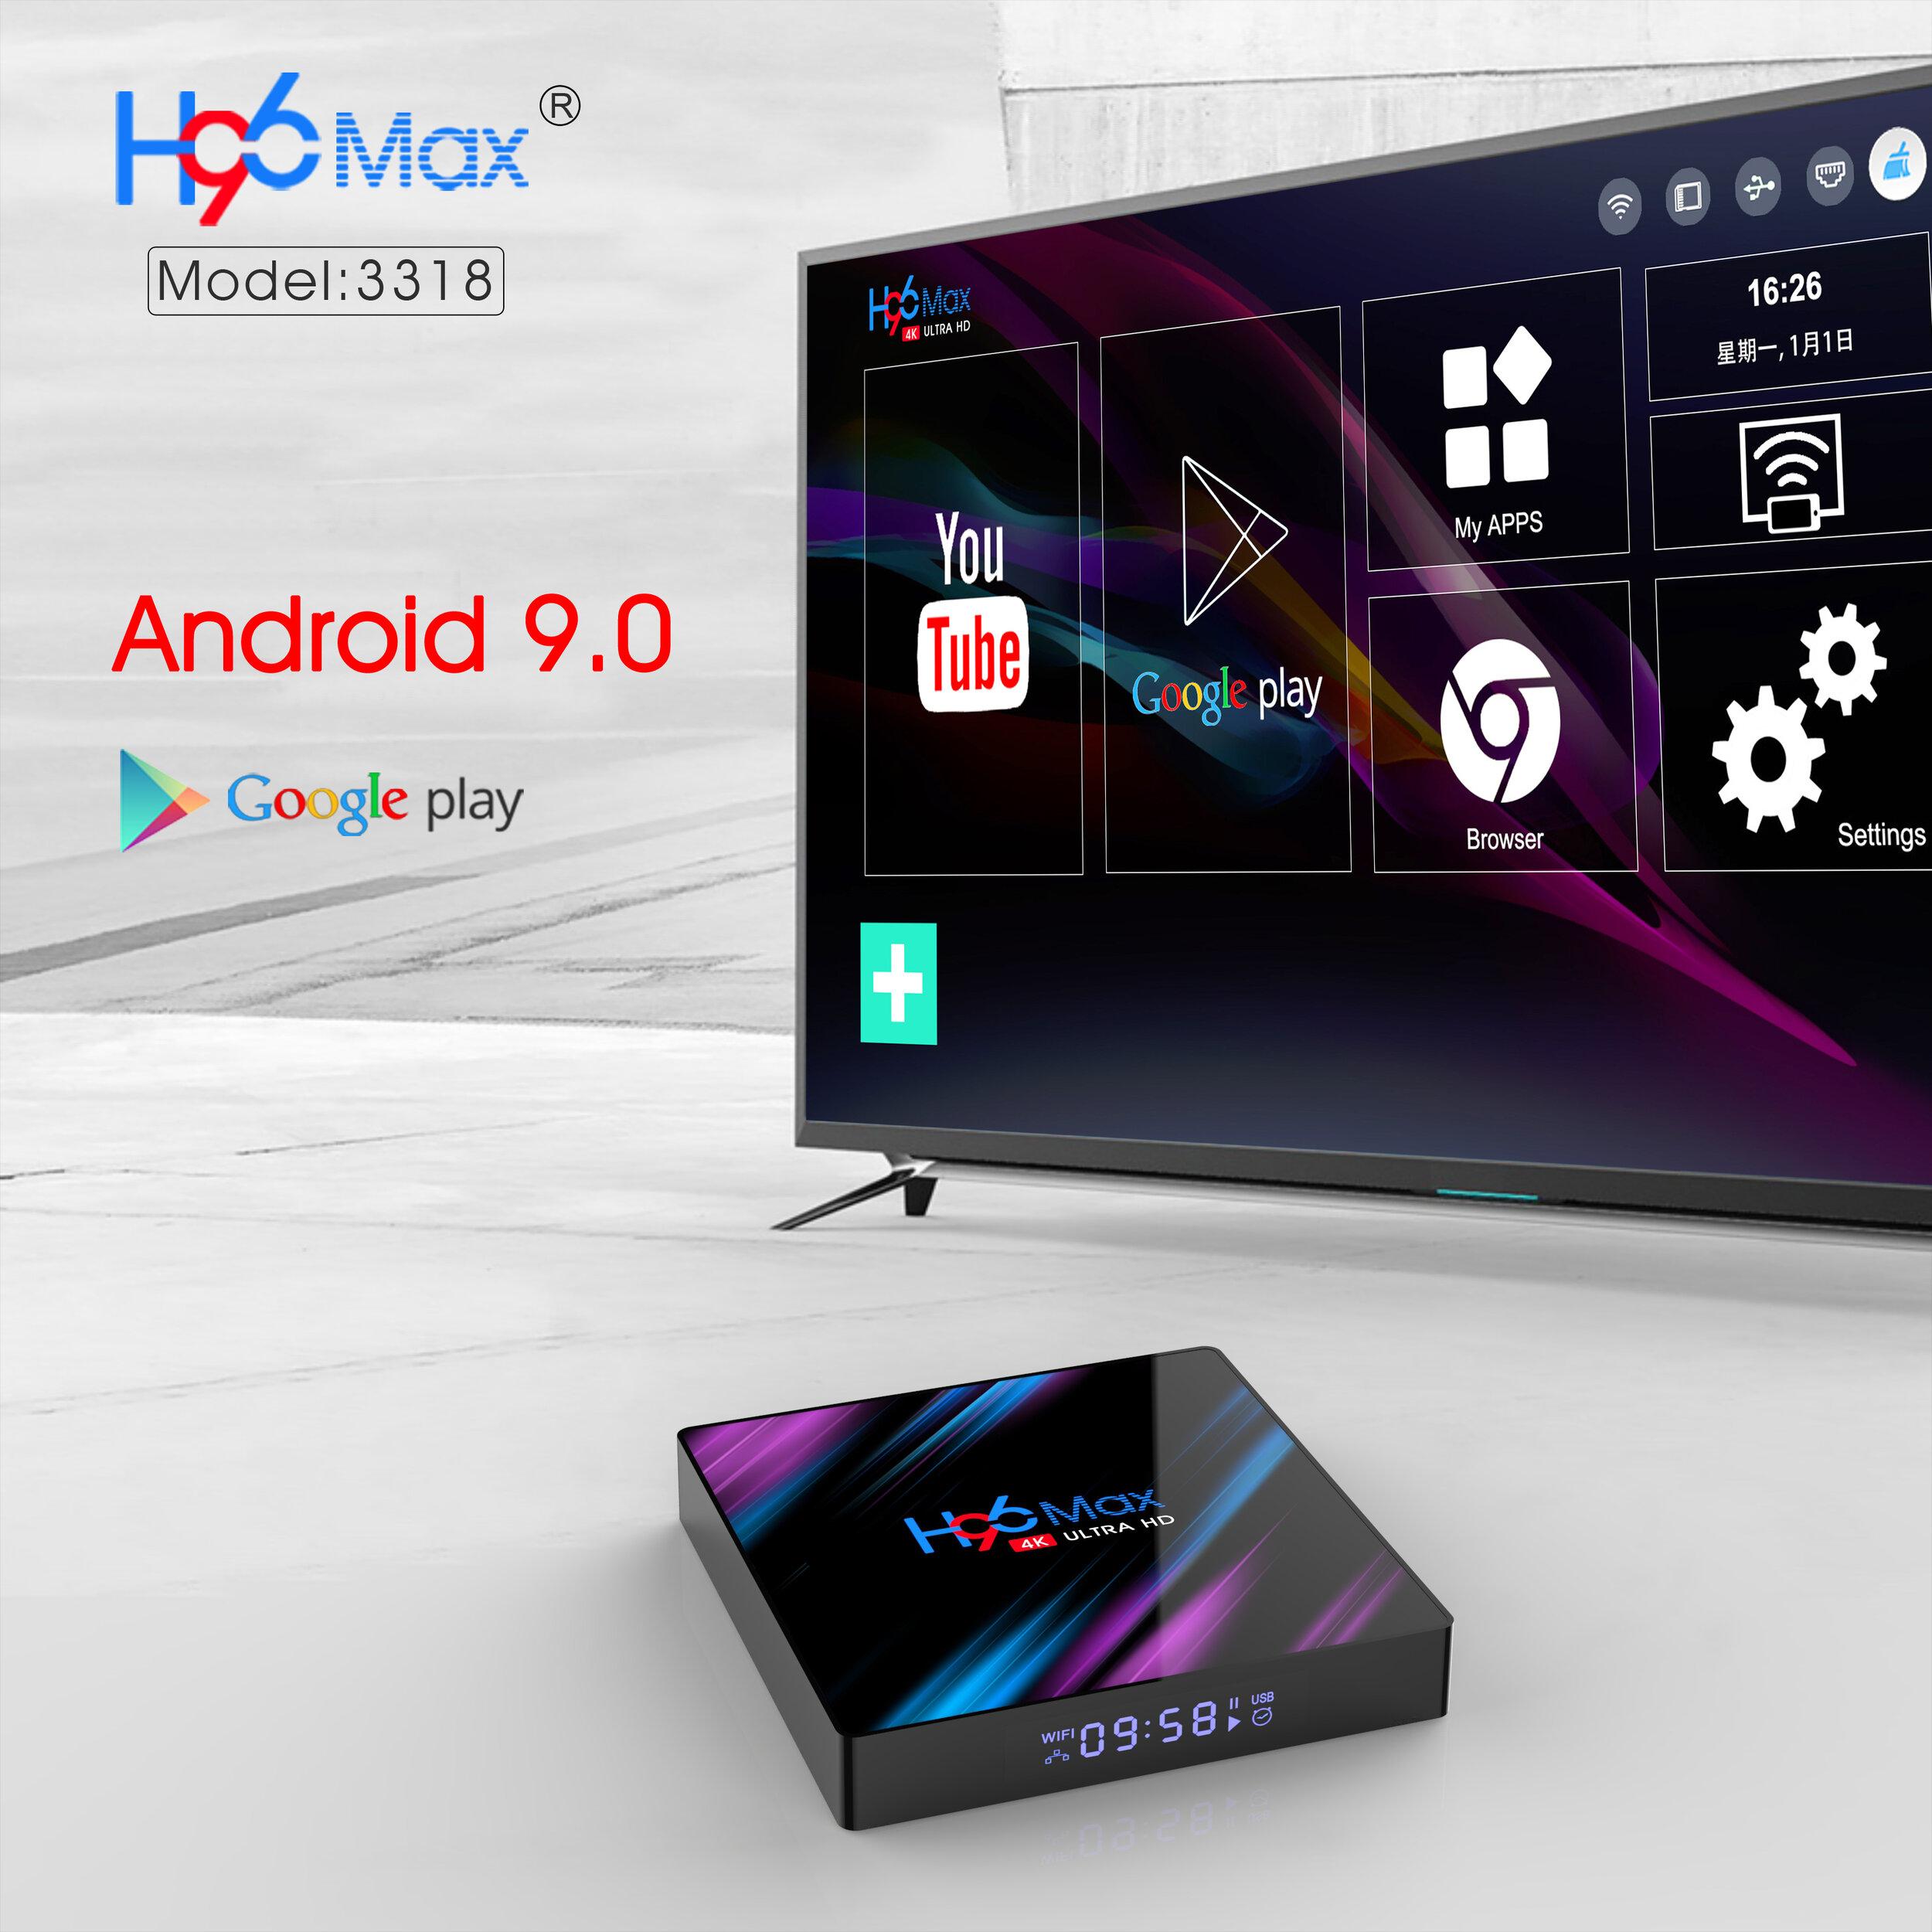 H96-MAX-RK3318-002-4GB.jpg